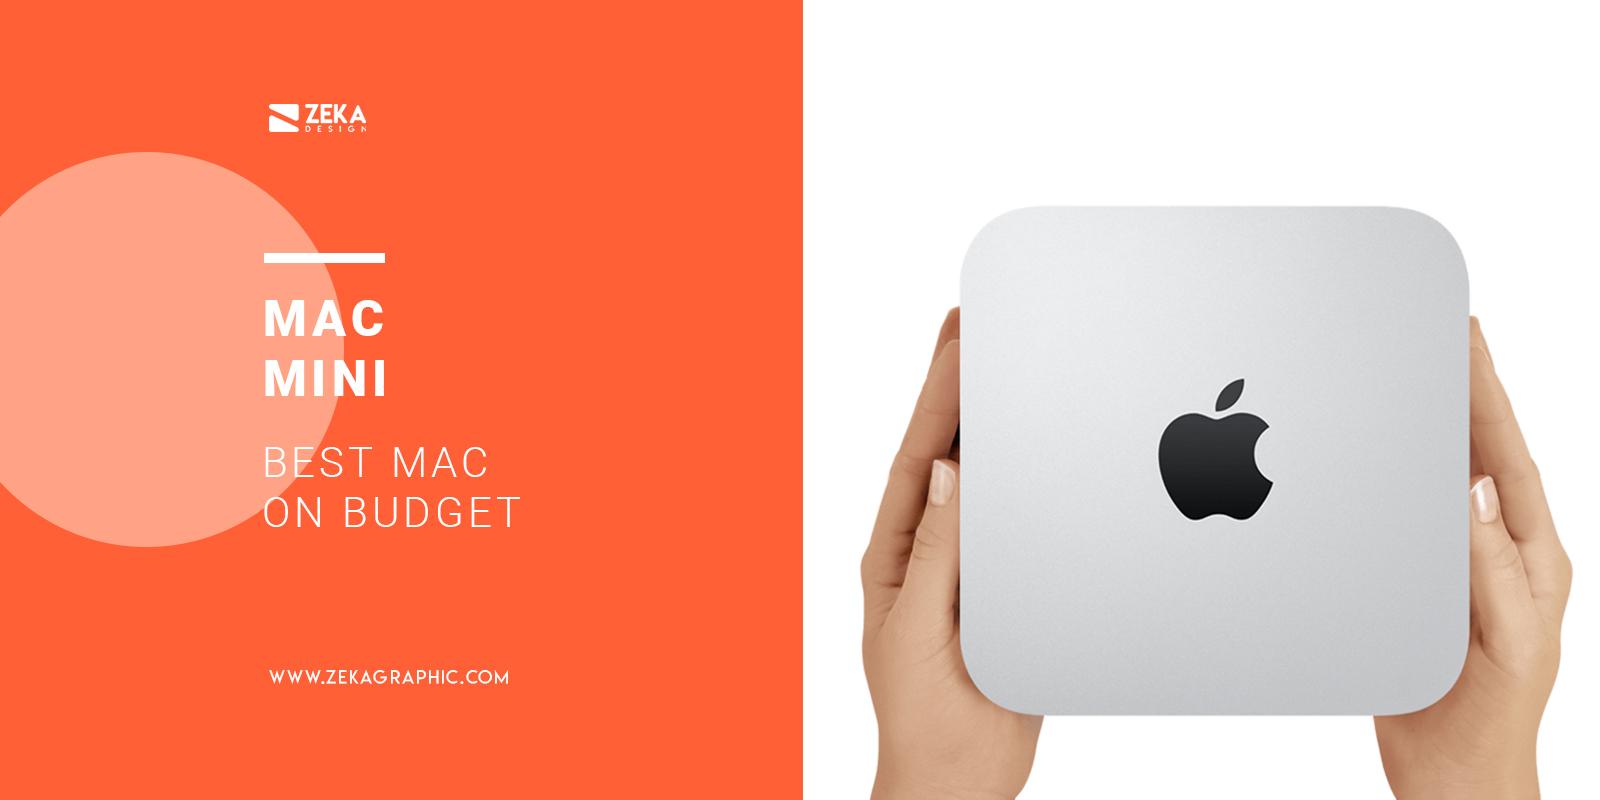 Mac Mini Best Mac On Budget For Graphic Design